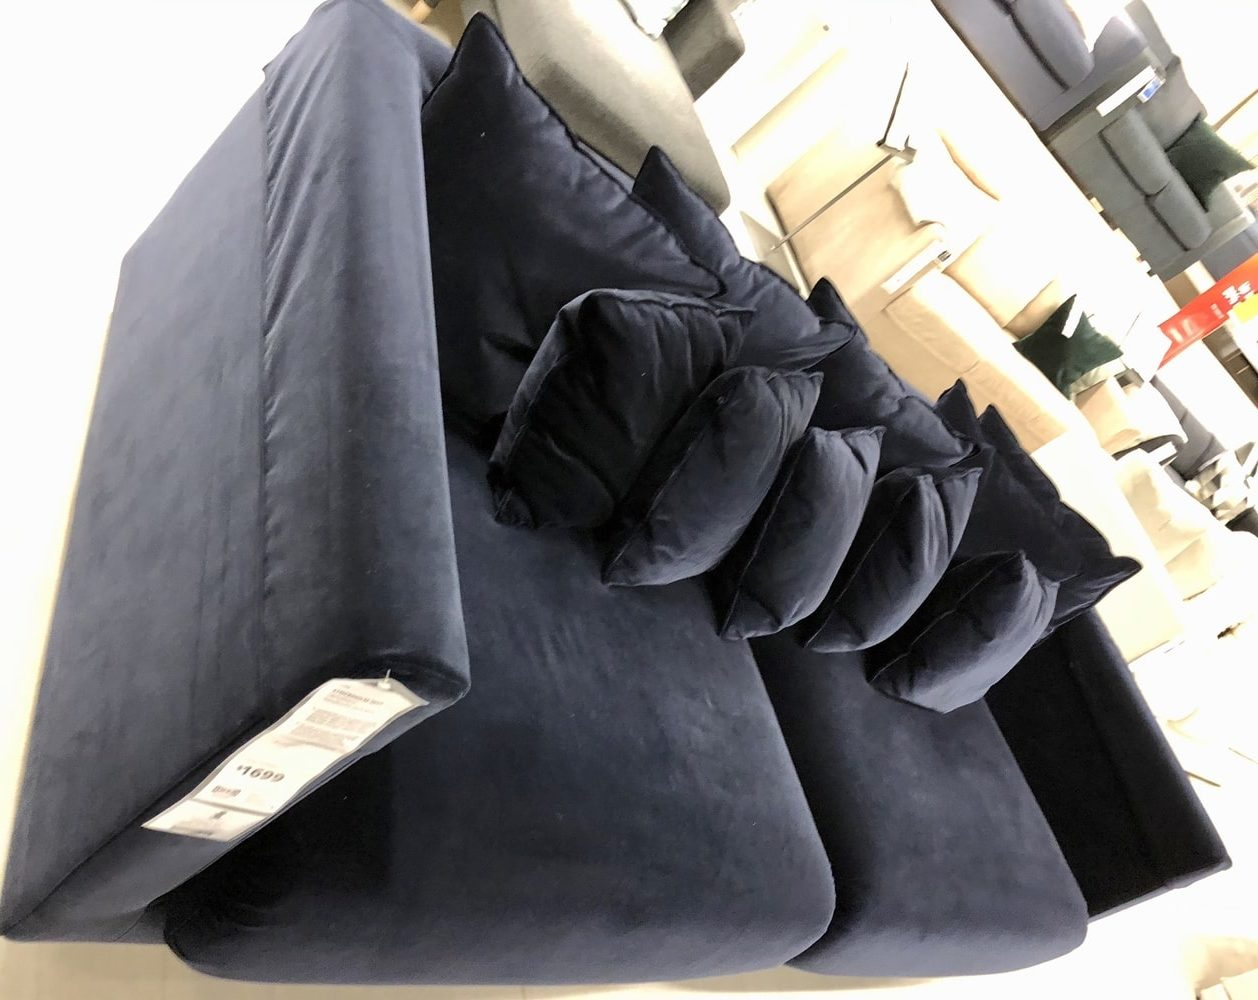 Stockholm 2017 sofa